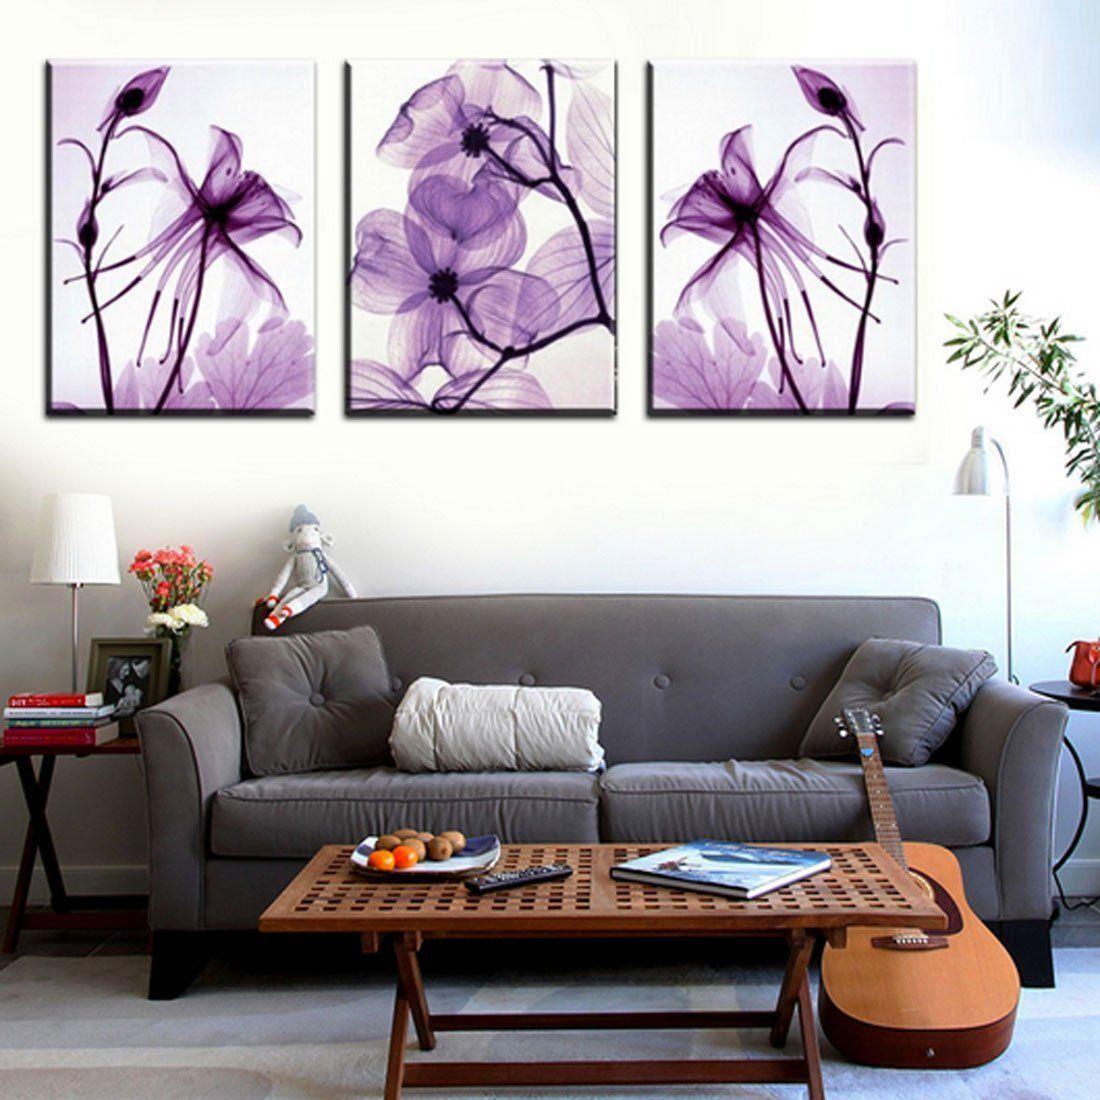 Hot sell 3 panels 40 x 60 cm modern wall